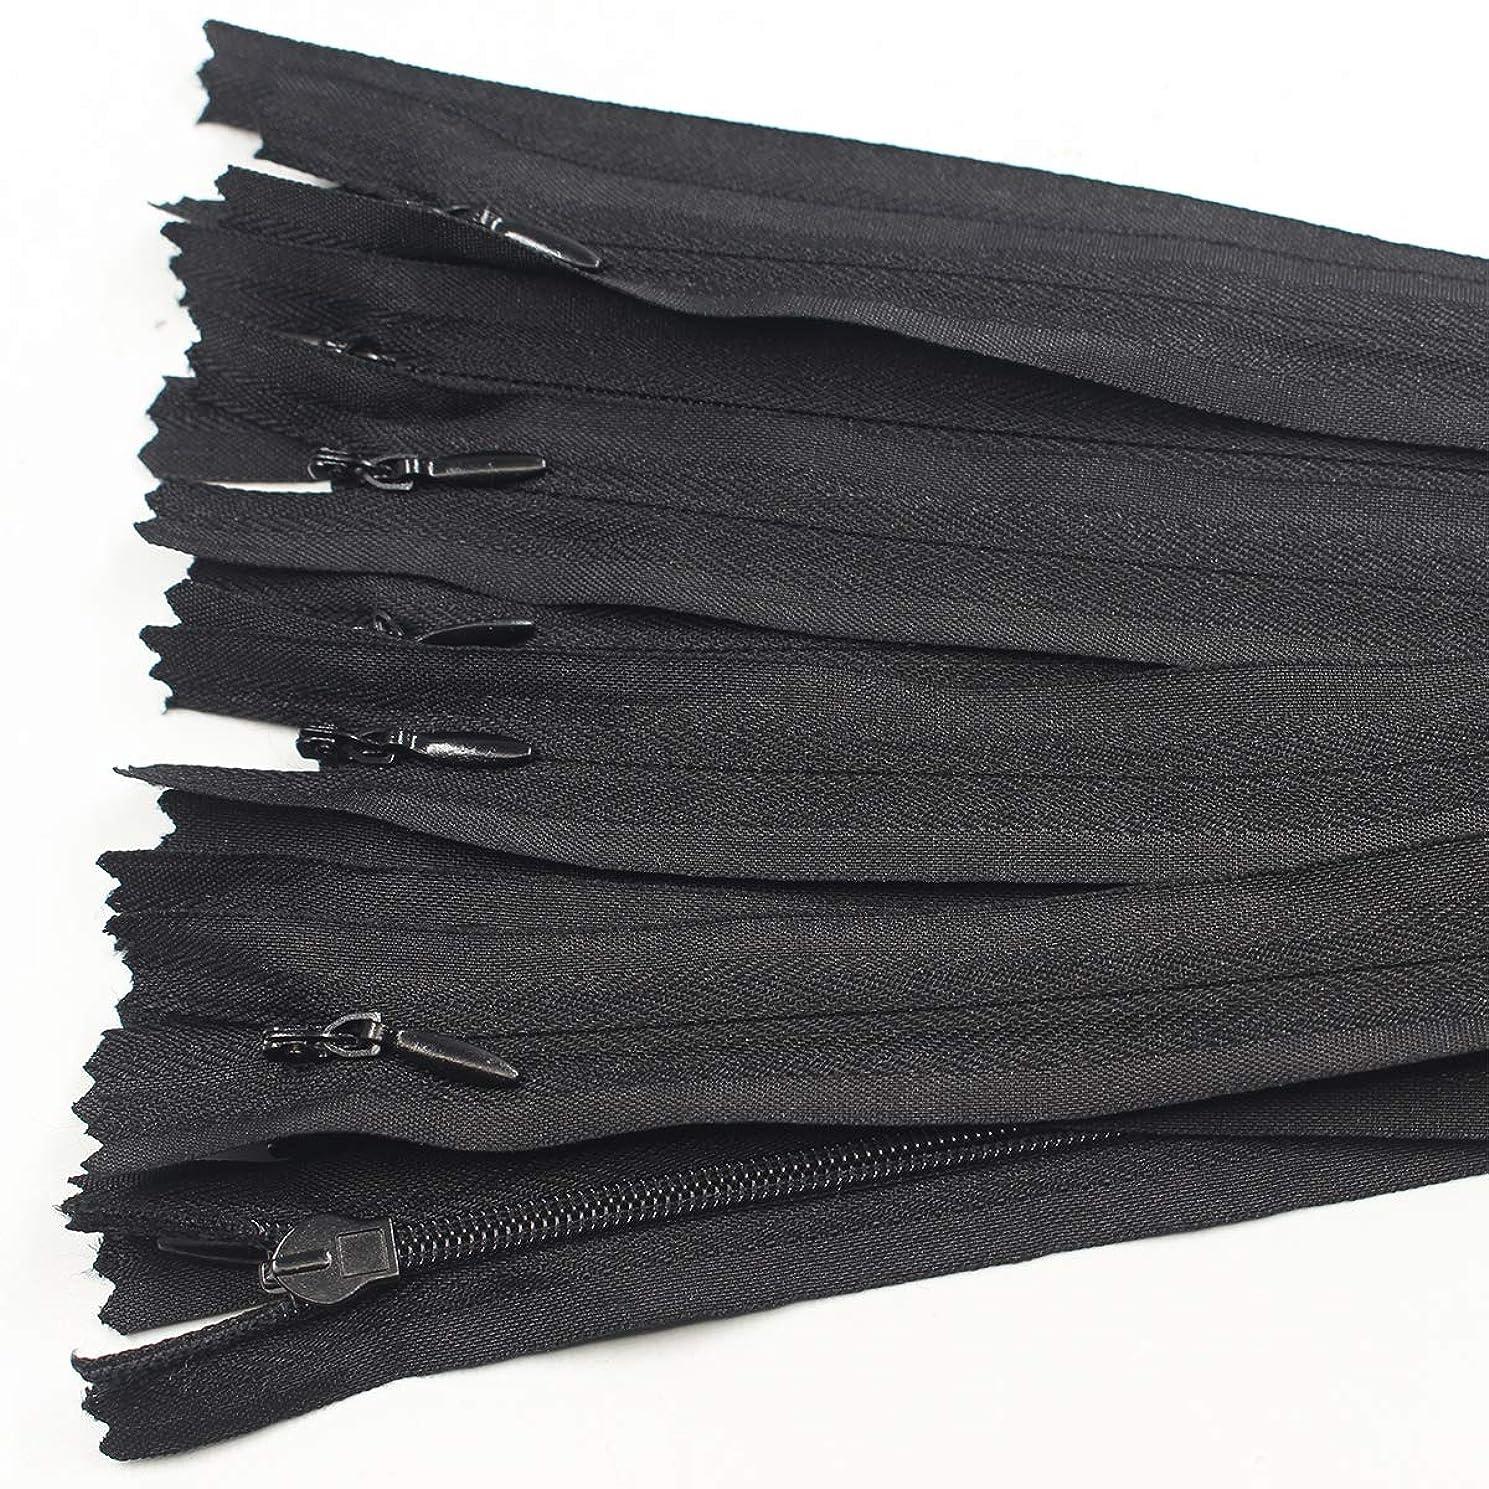 40 PCS Nylon Invisible Zipper Tailor DIY Sewing Tools for Garment/Bags/Home Textile (22 inch. Black, 40pcs)